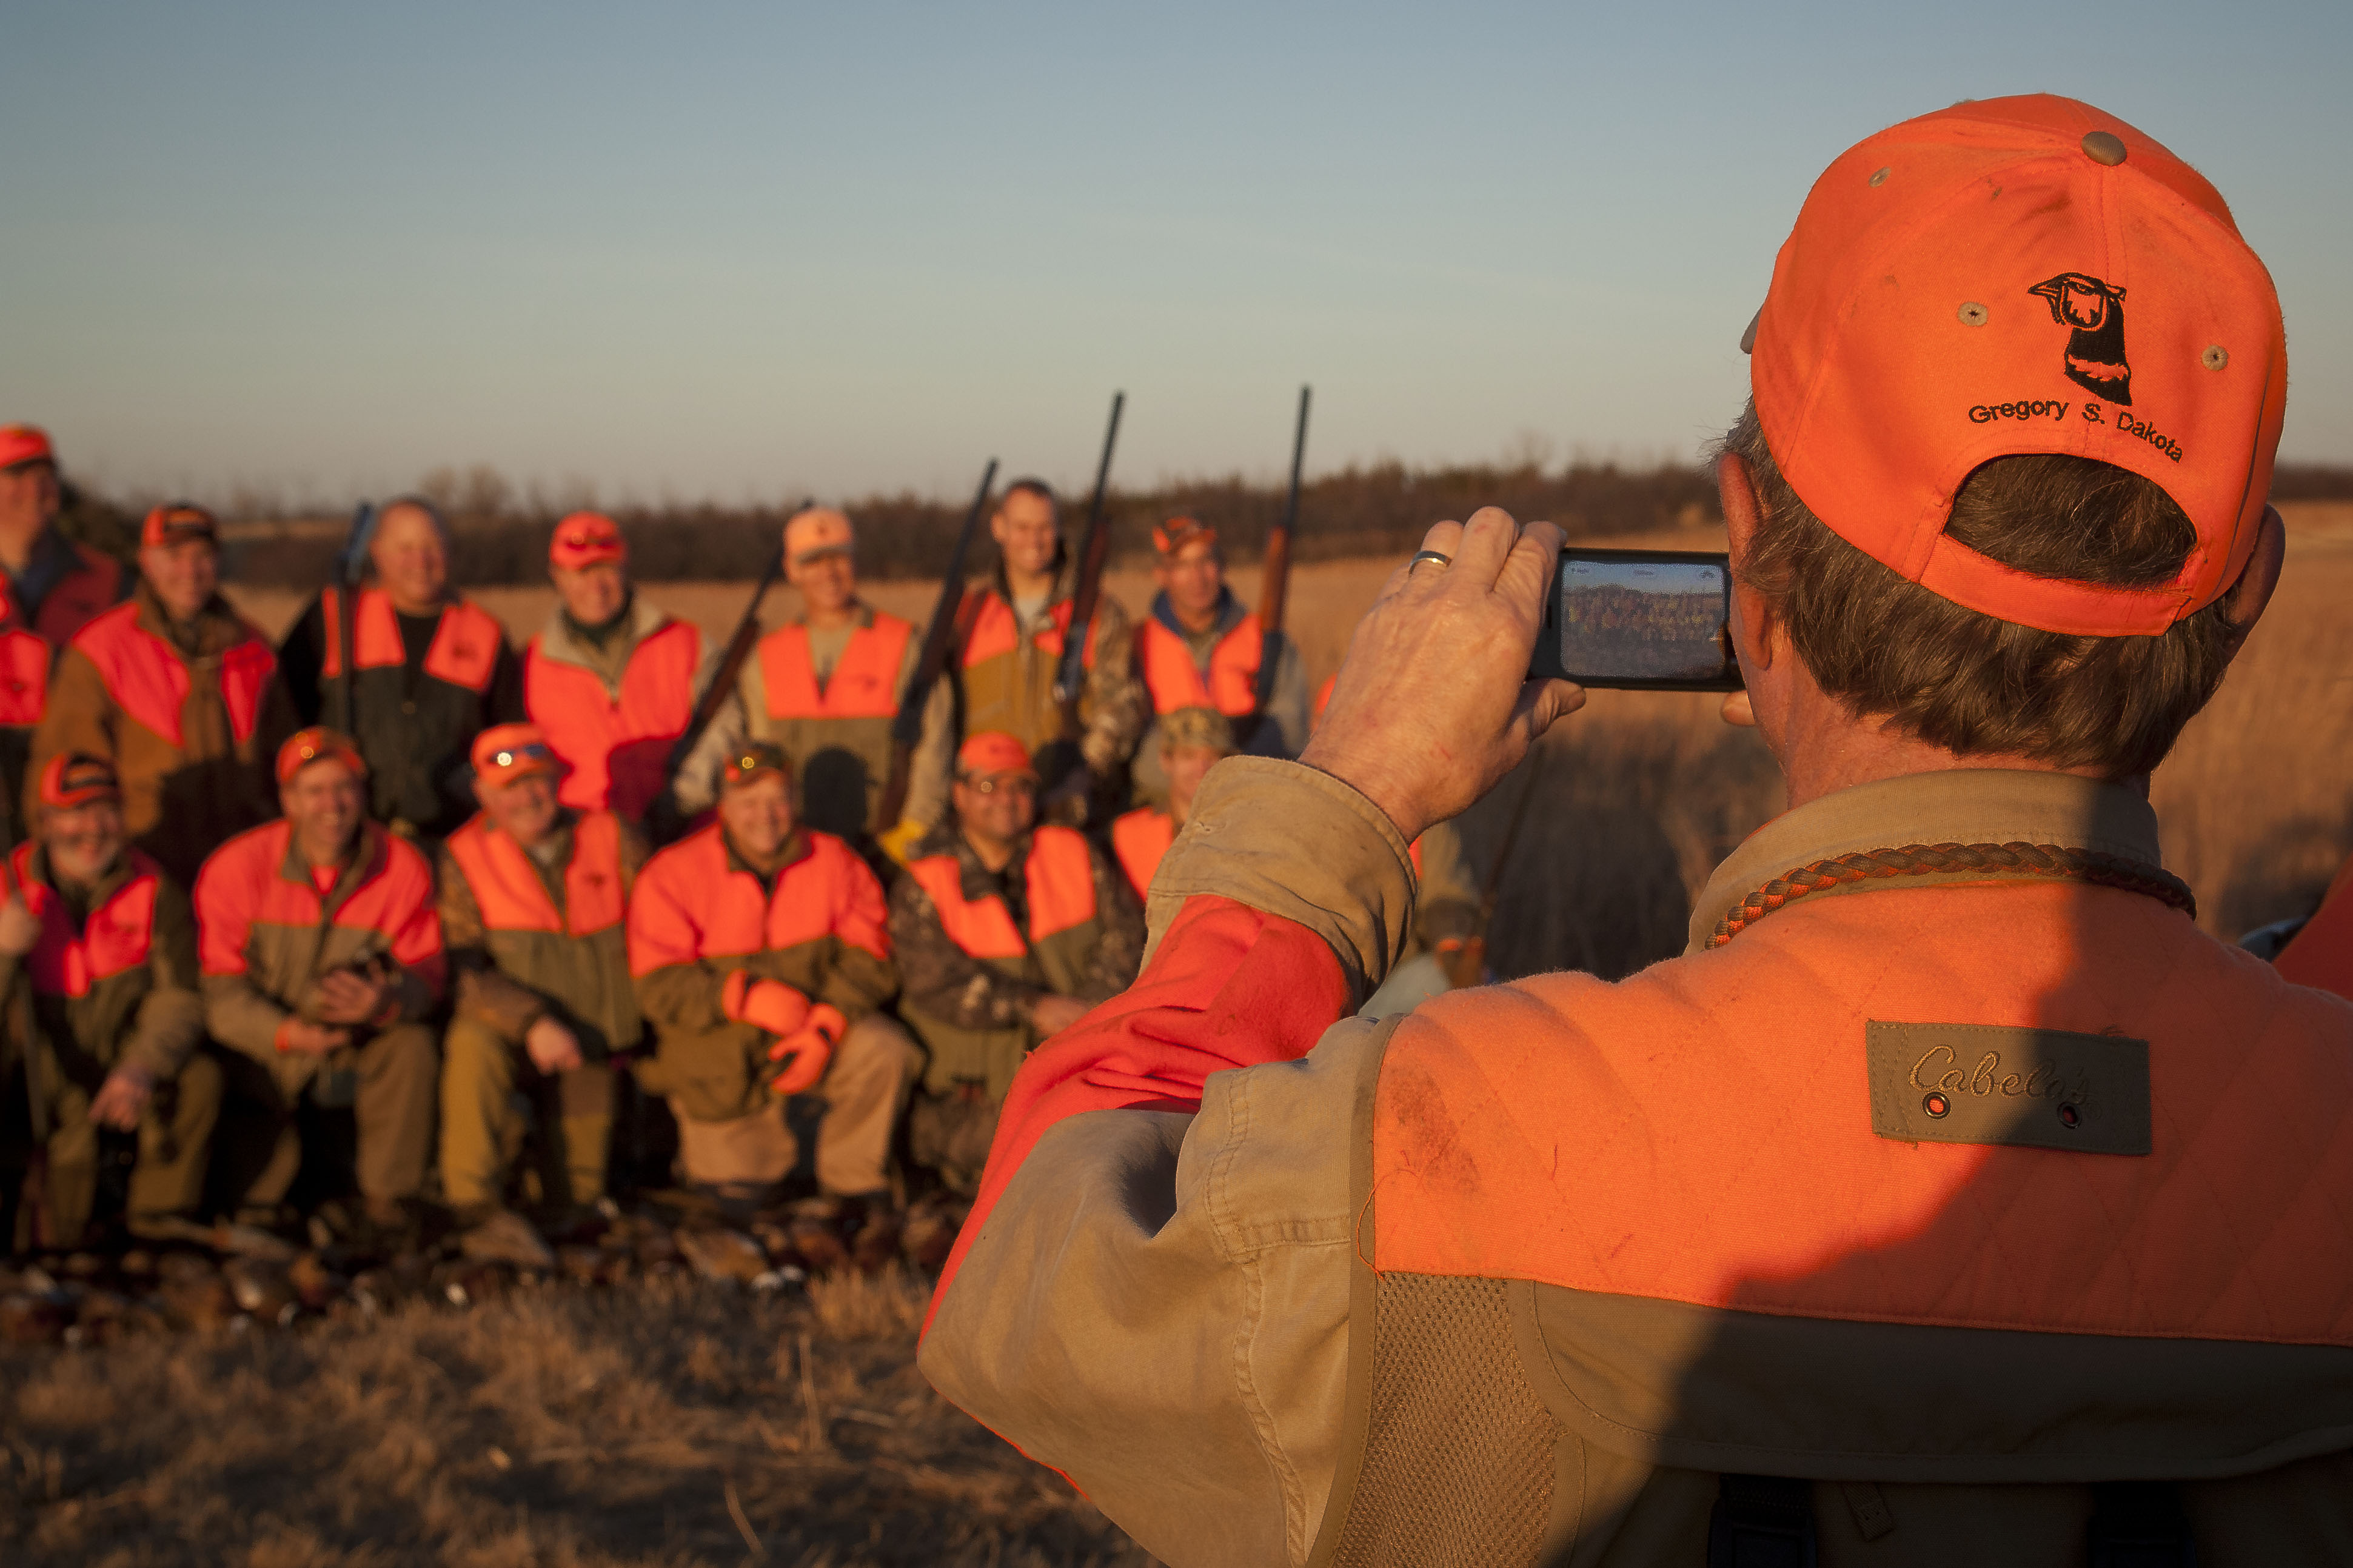 Pheasant hunting party at Stukel's